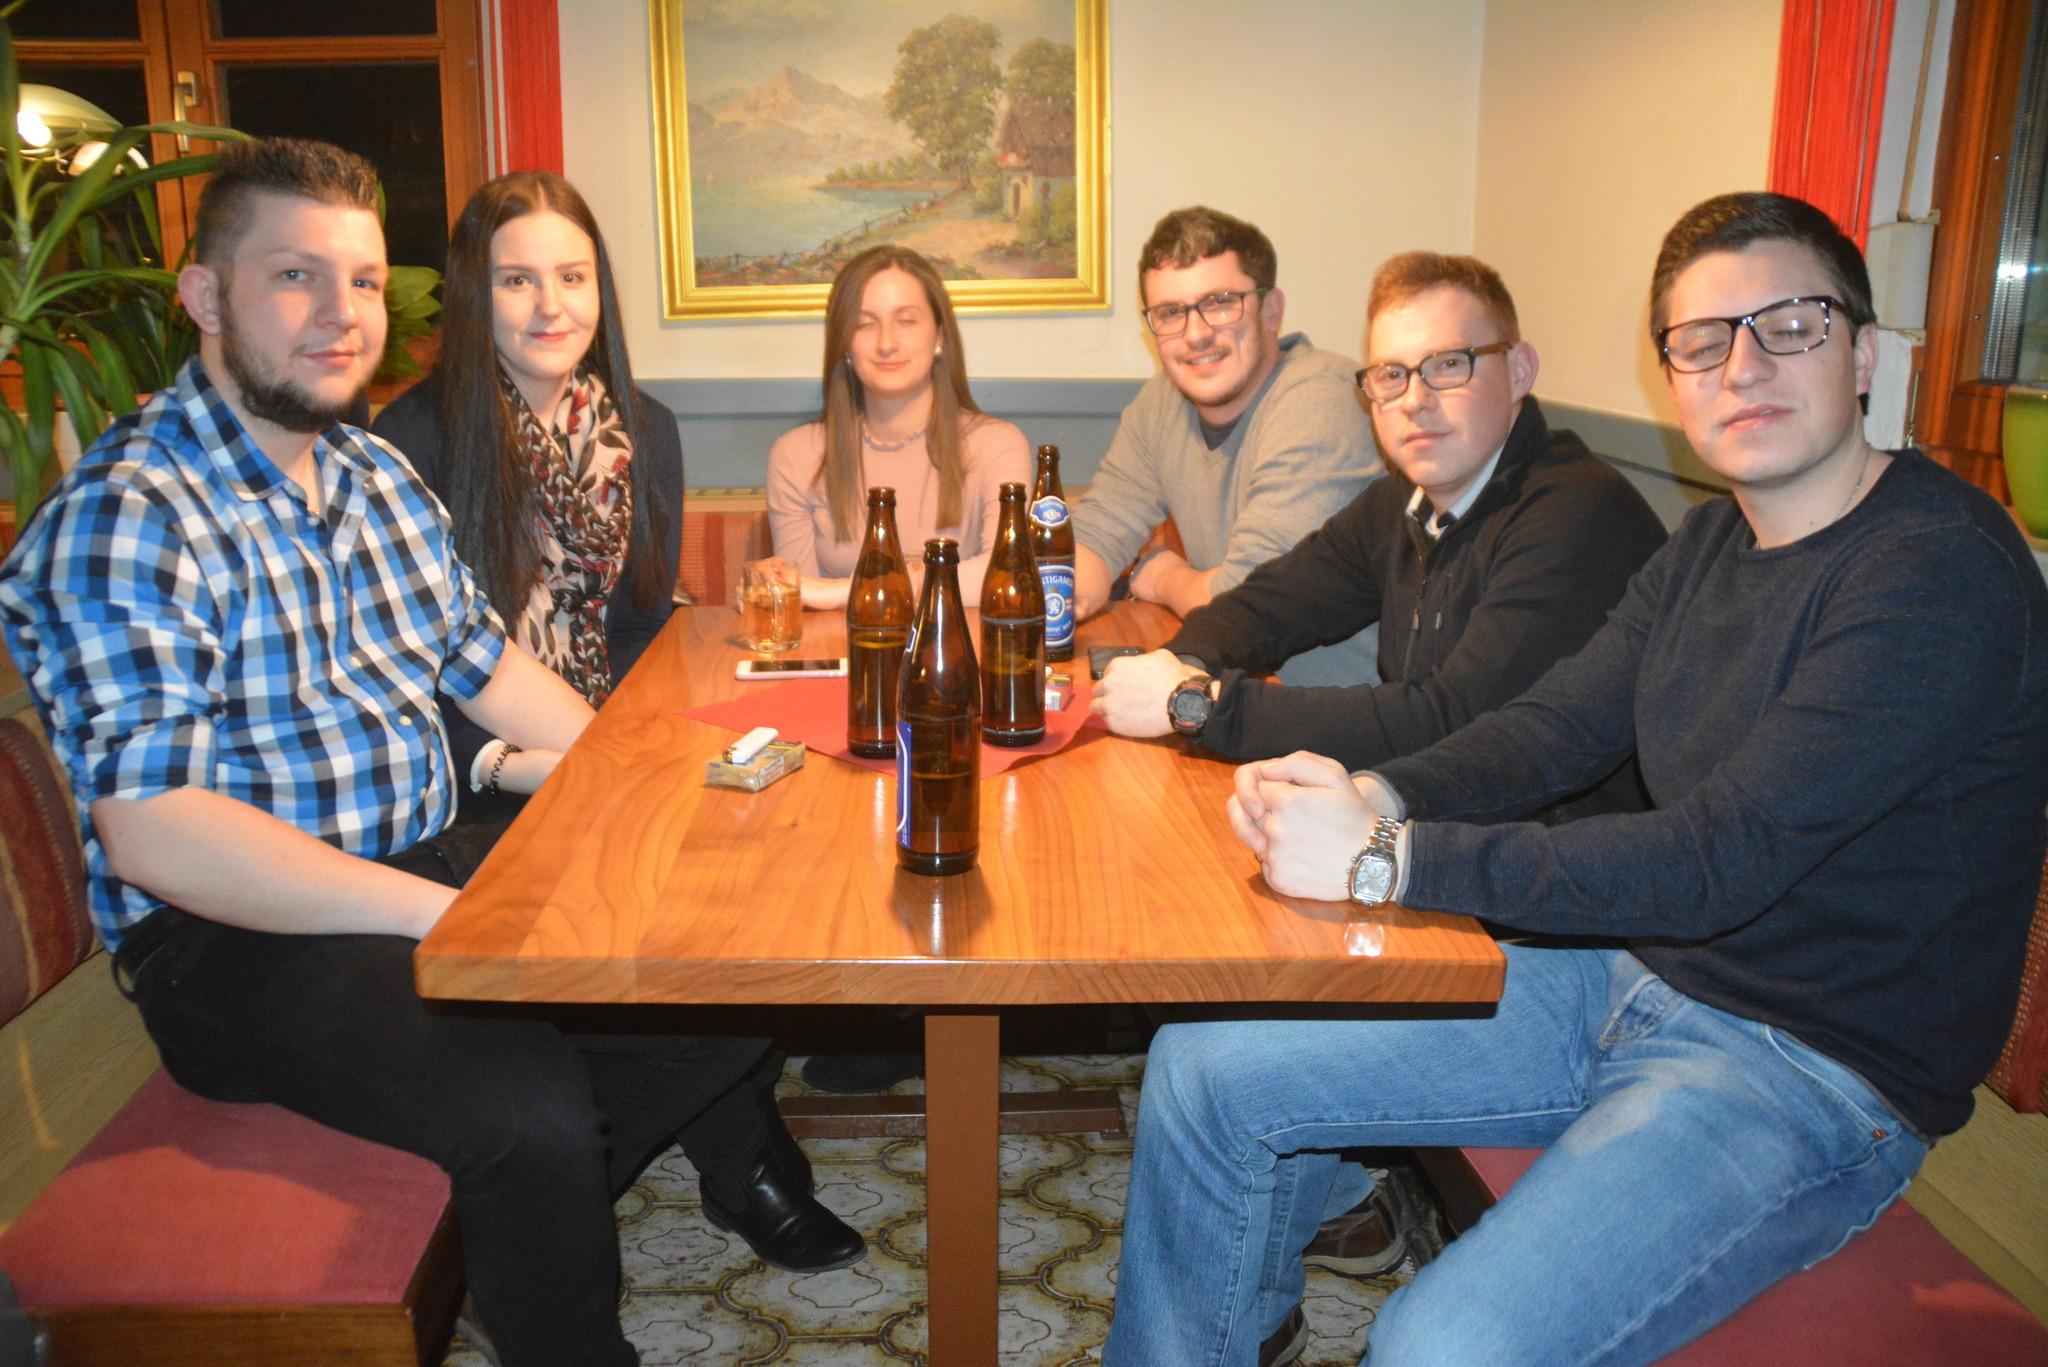 Erffnungsparty fr Wilmas Singletreff in Grodnau - Oberwart